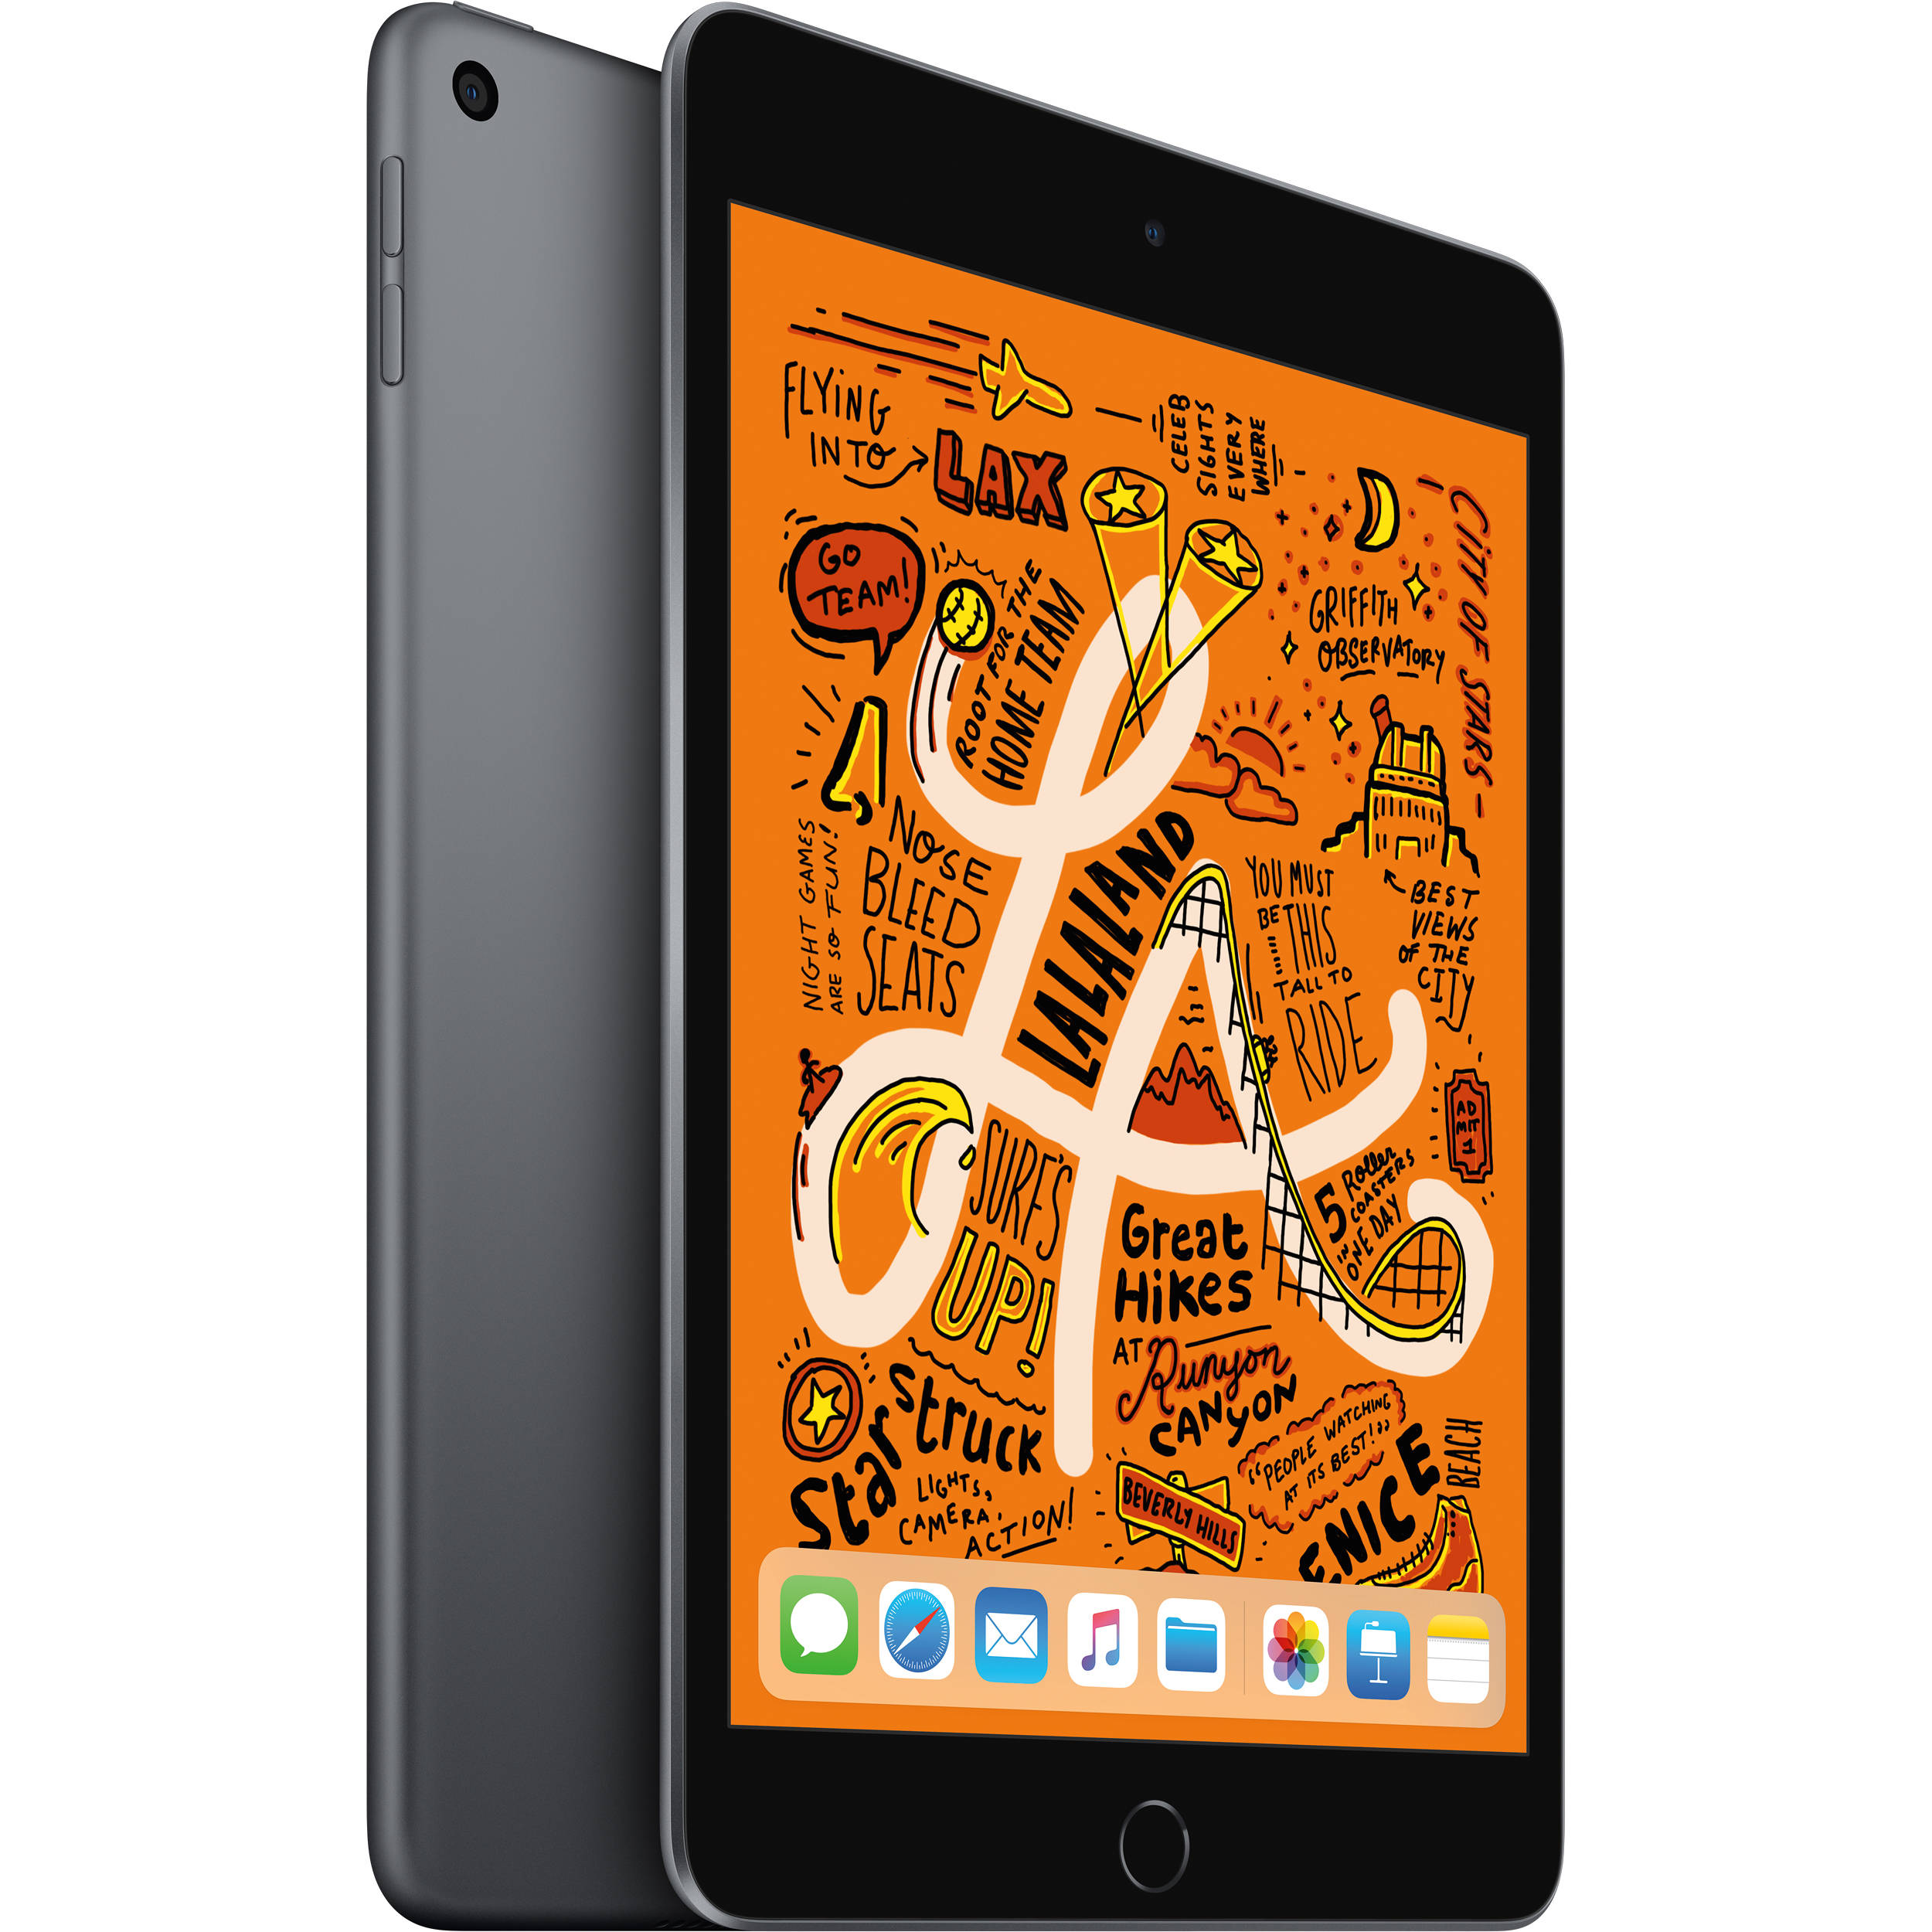 R-D Apple iPad Mini 2nd Gen 16GB  Wi-Fi 7.9in Gray Silver /& White